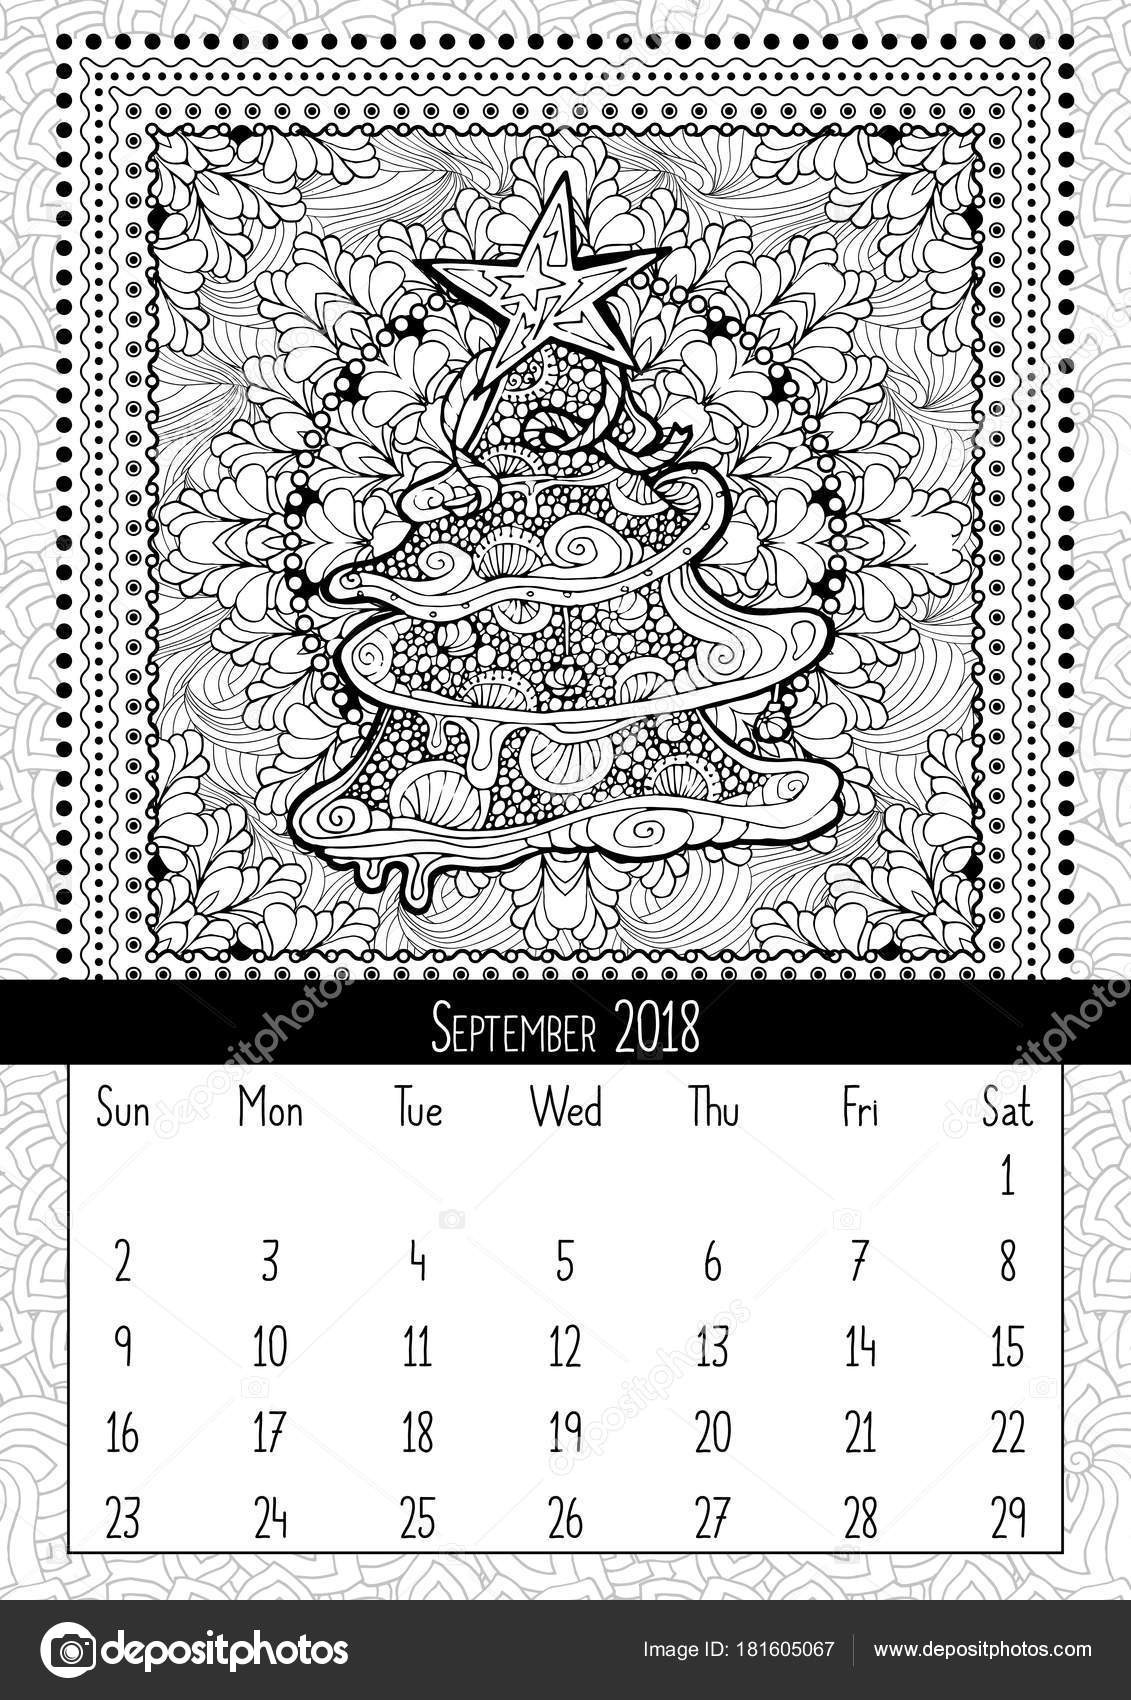 depositphotos stock illustration christmas tree doodle pattern calendar